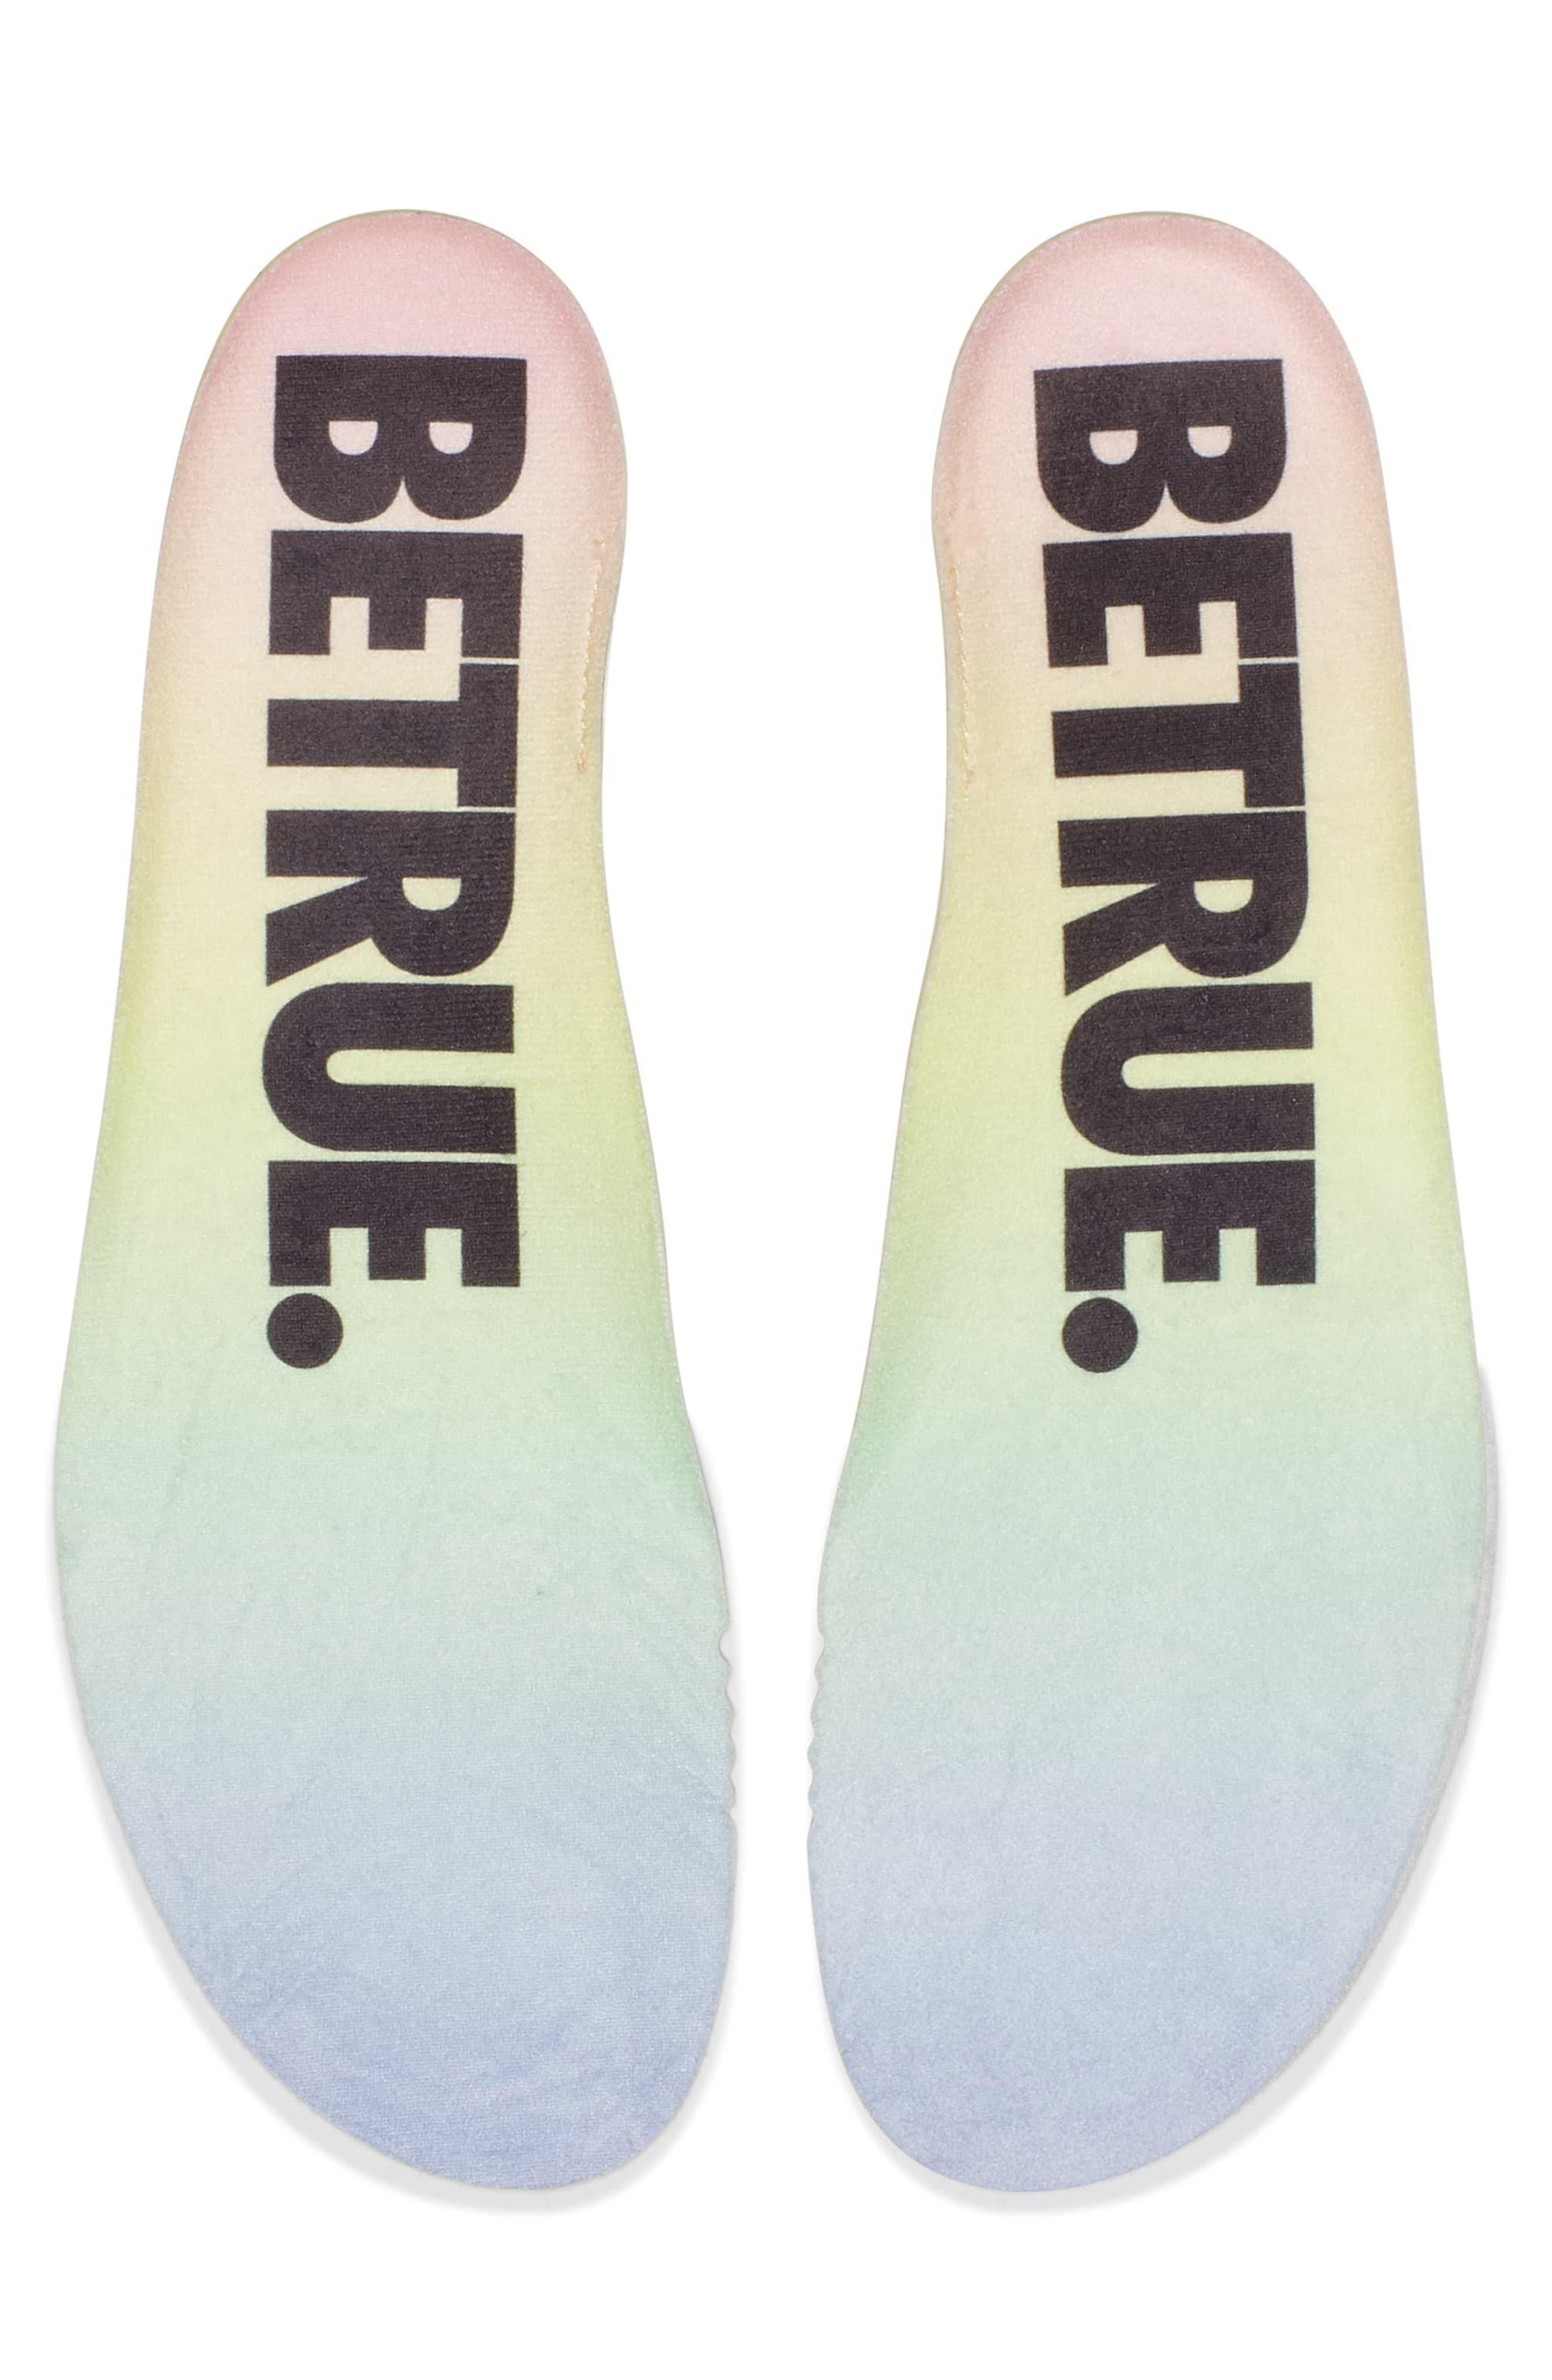 Nordstrom x Nike Zoom Fly BETRUE Running Shoe,                             Alternate thumbnail 7, color,                             White/ Black/ Palest Purple